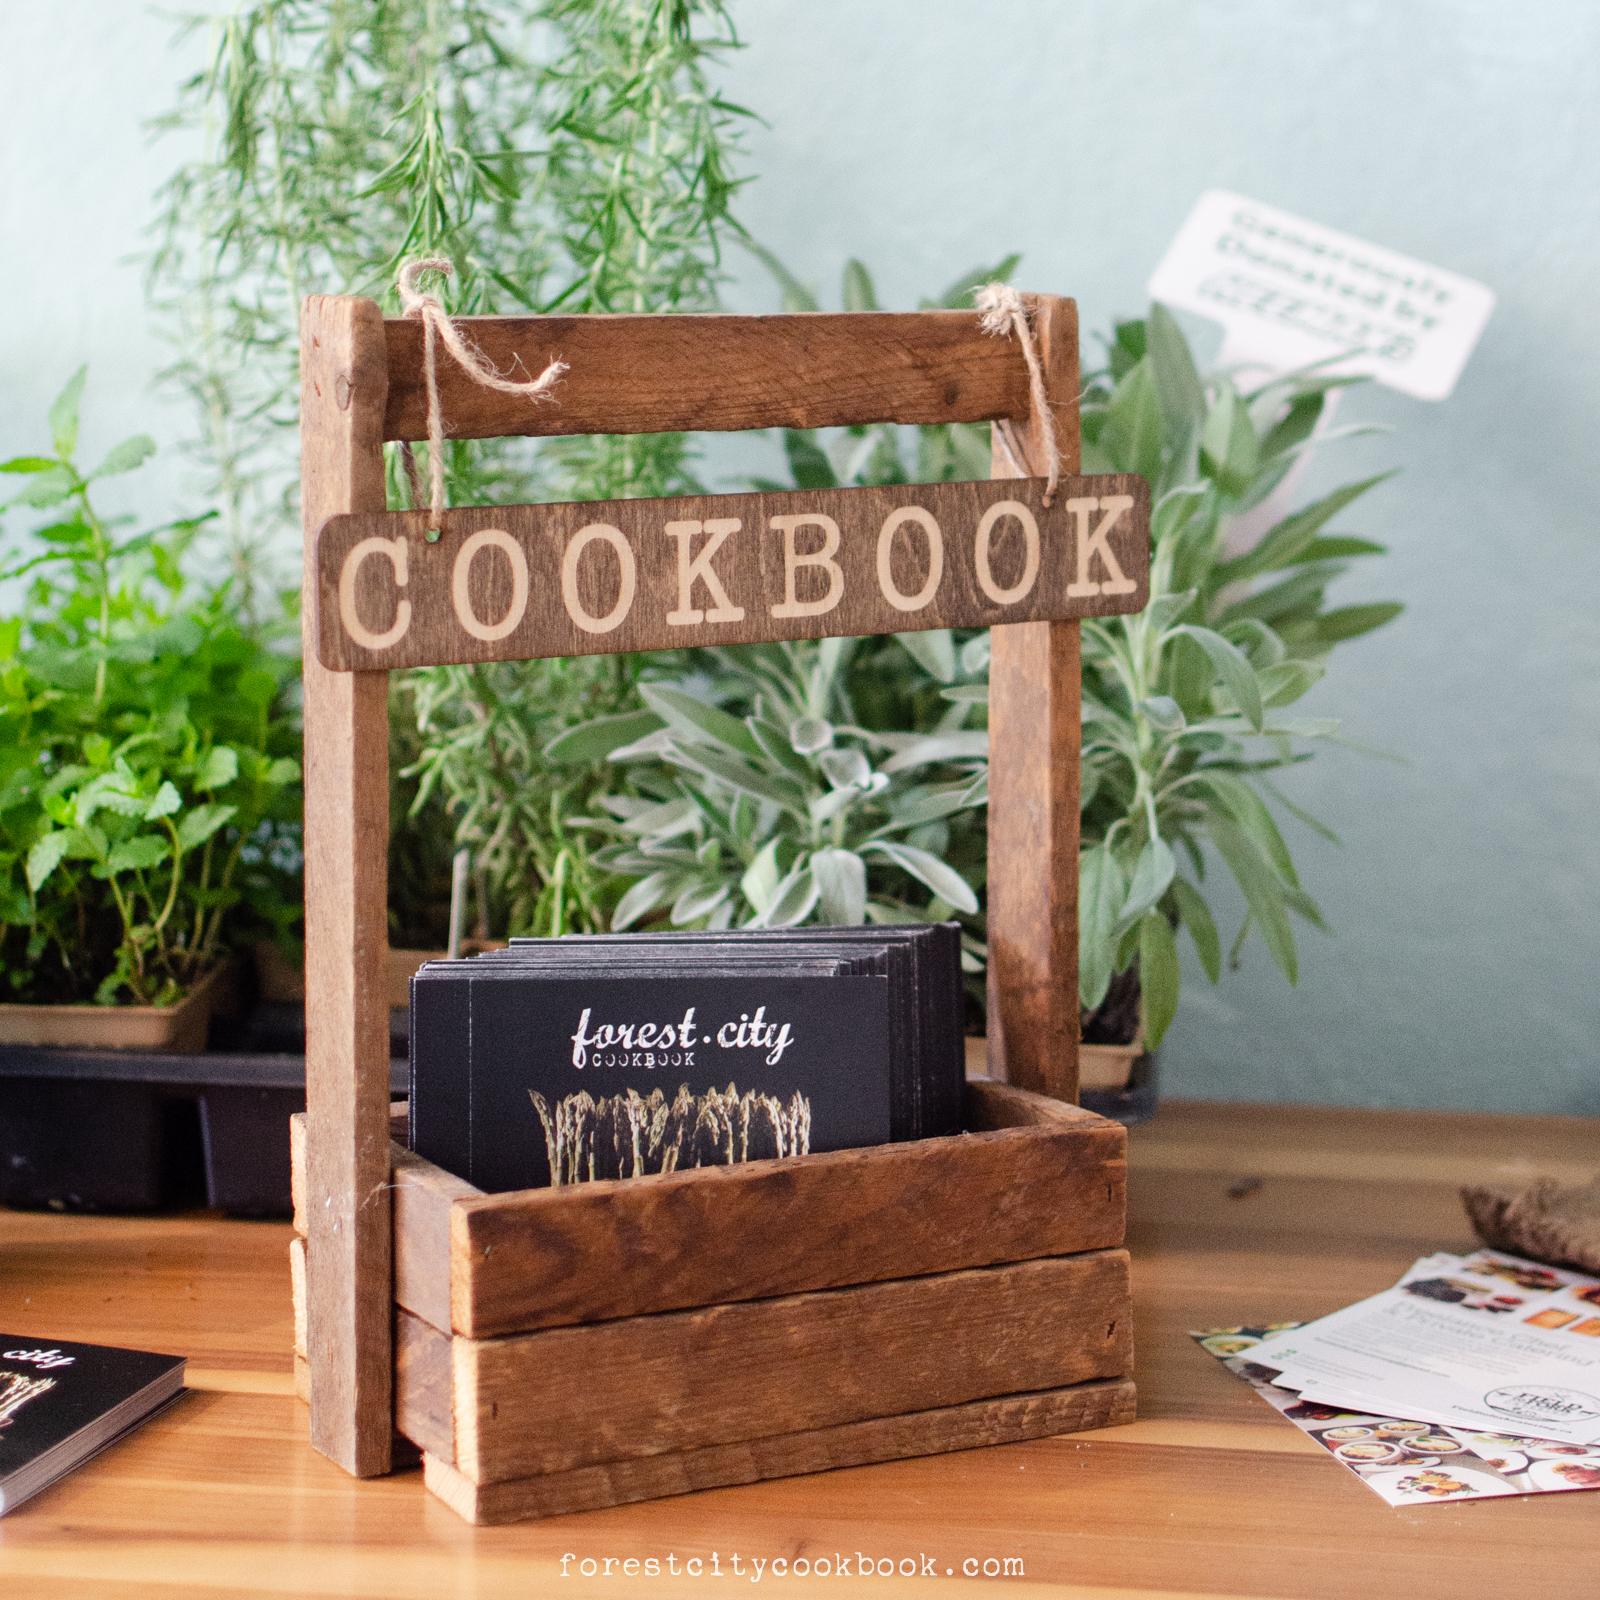 Forest City Cookbook - London Ontario-0400.jpg